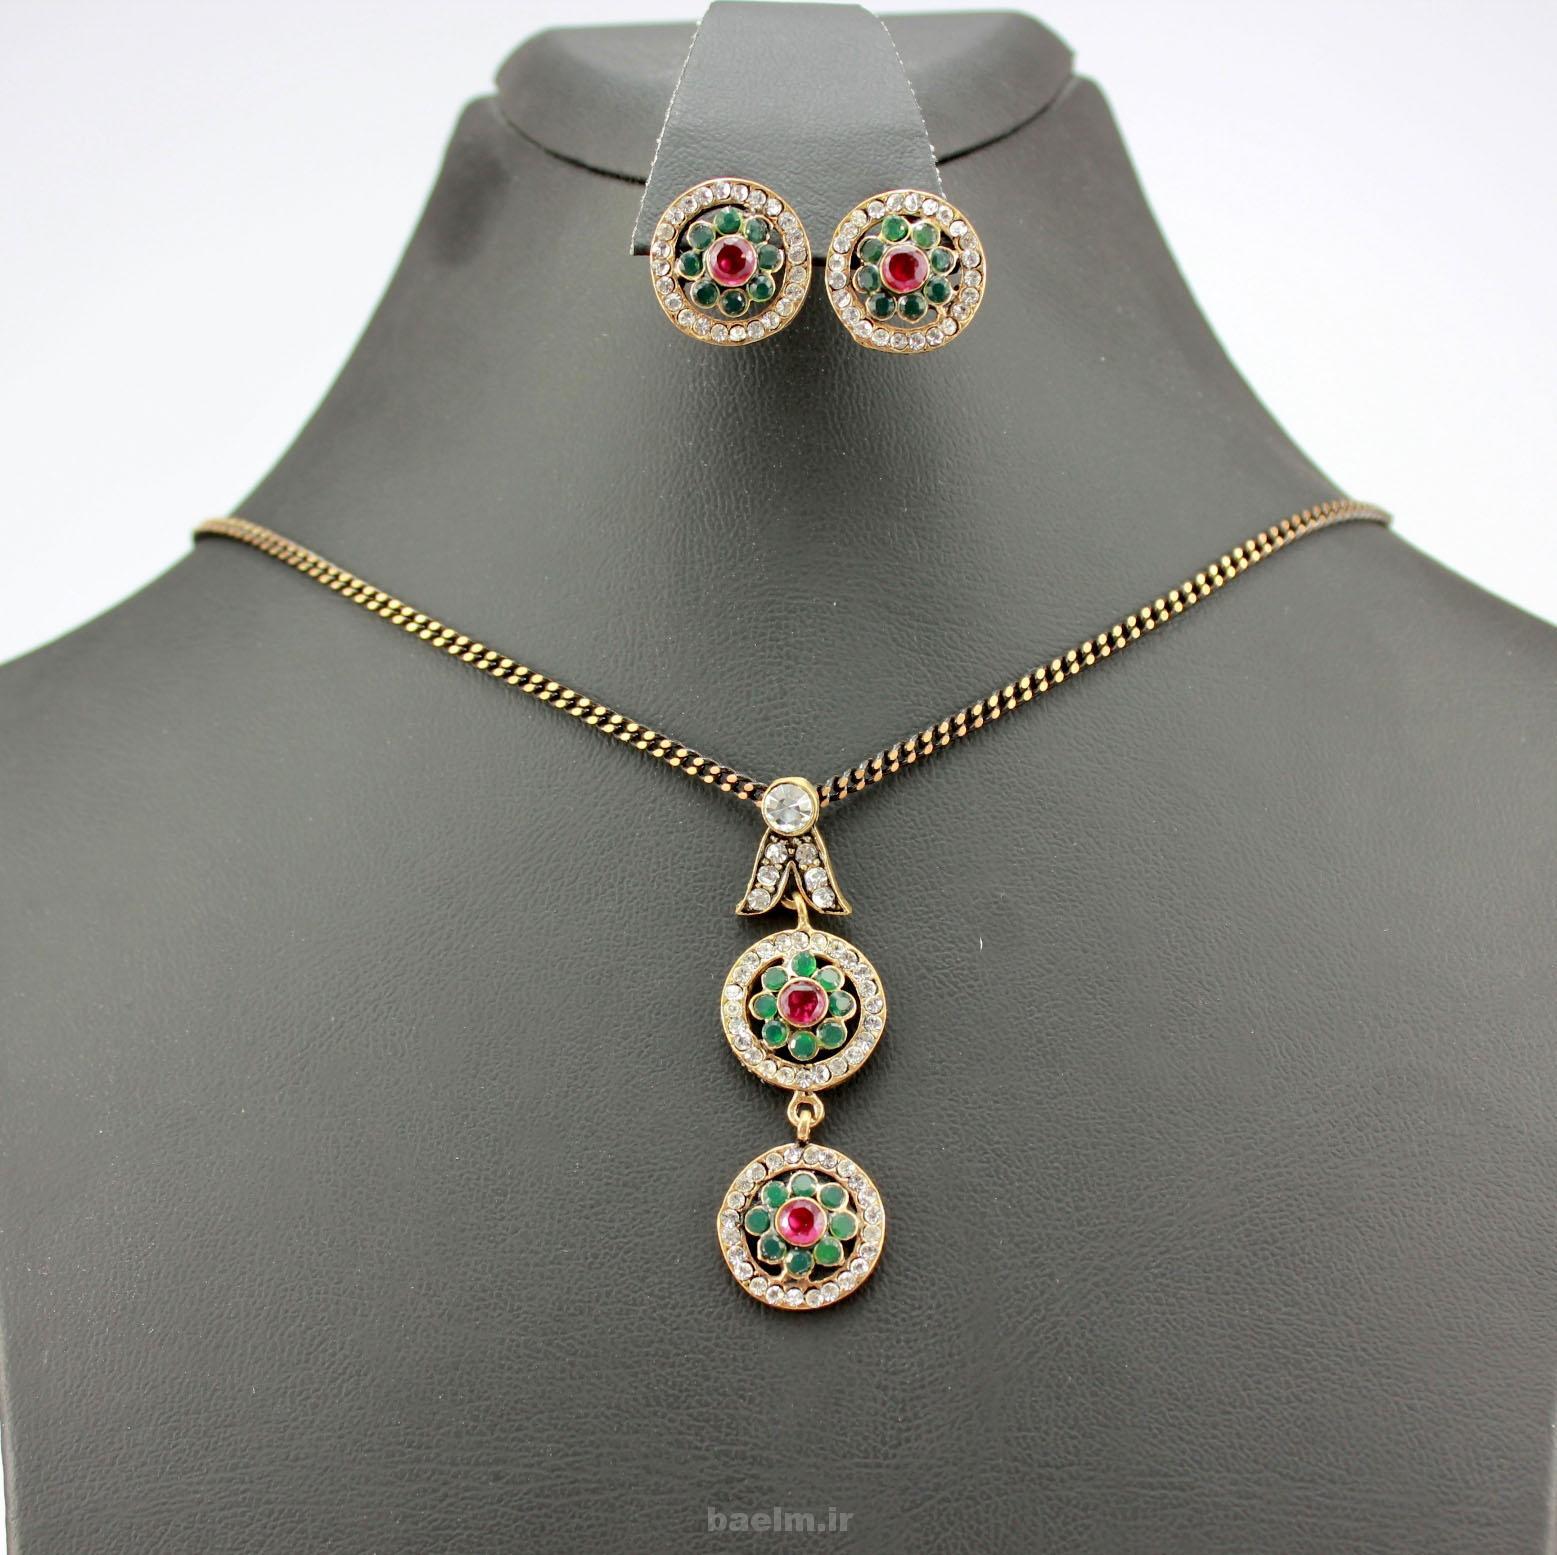 jewelry sets 7 Jewelry Sets